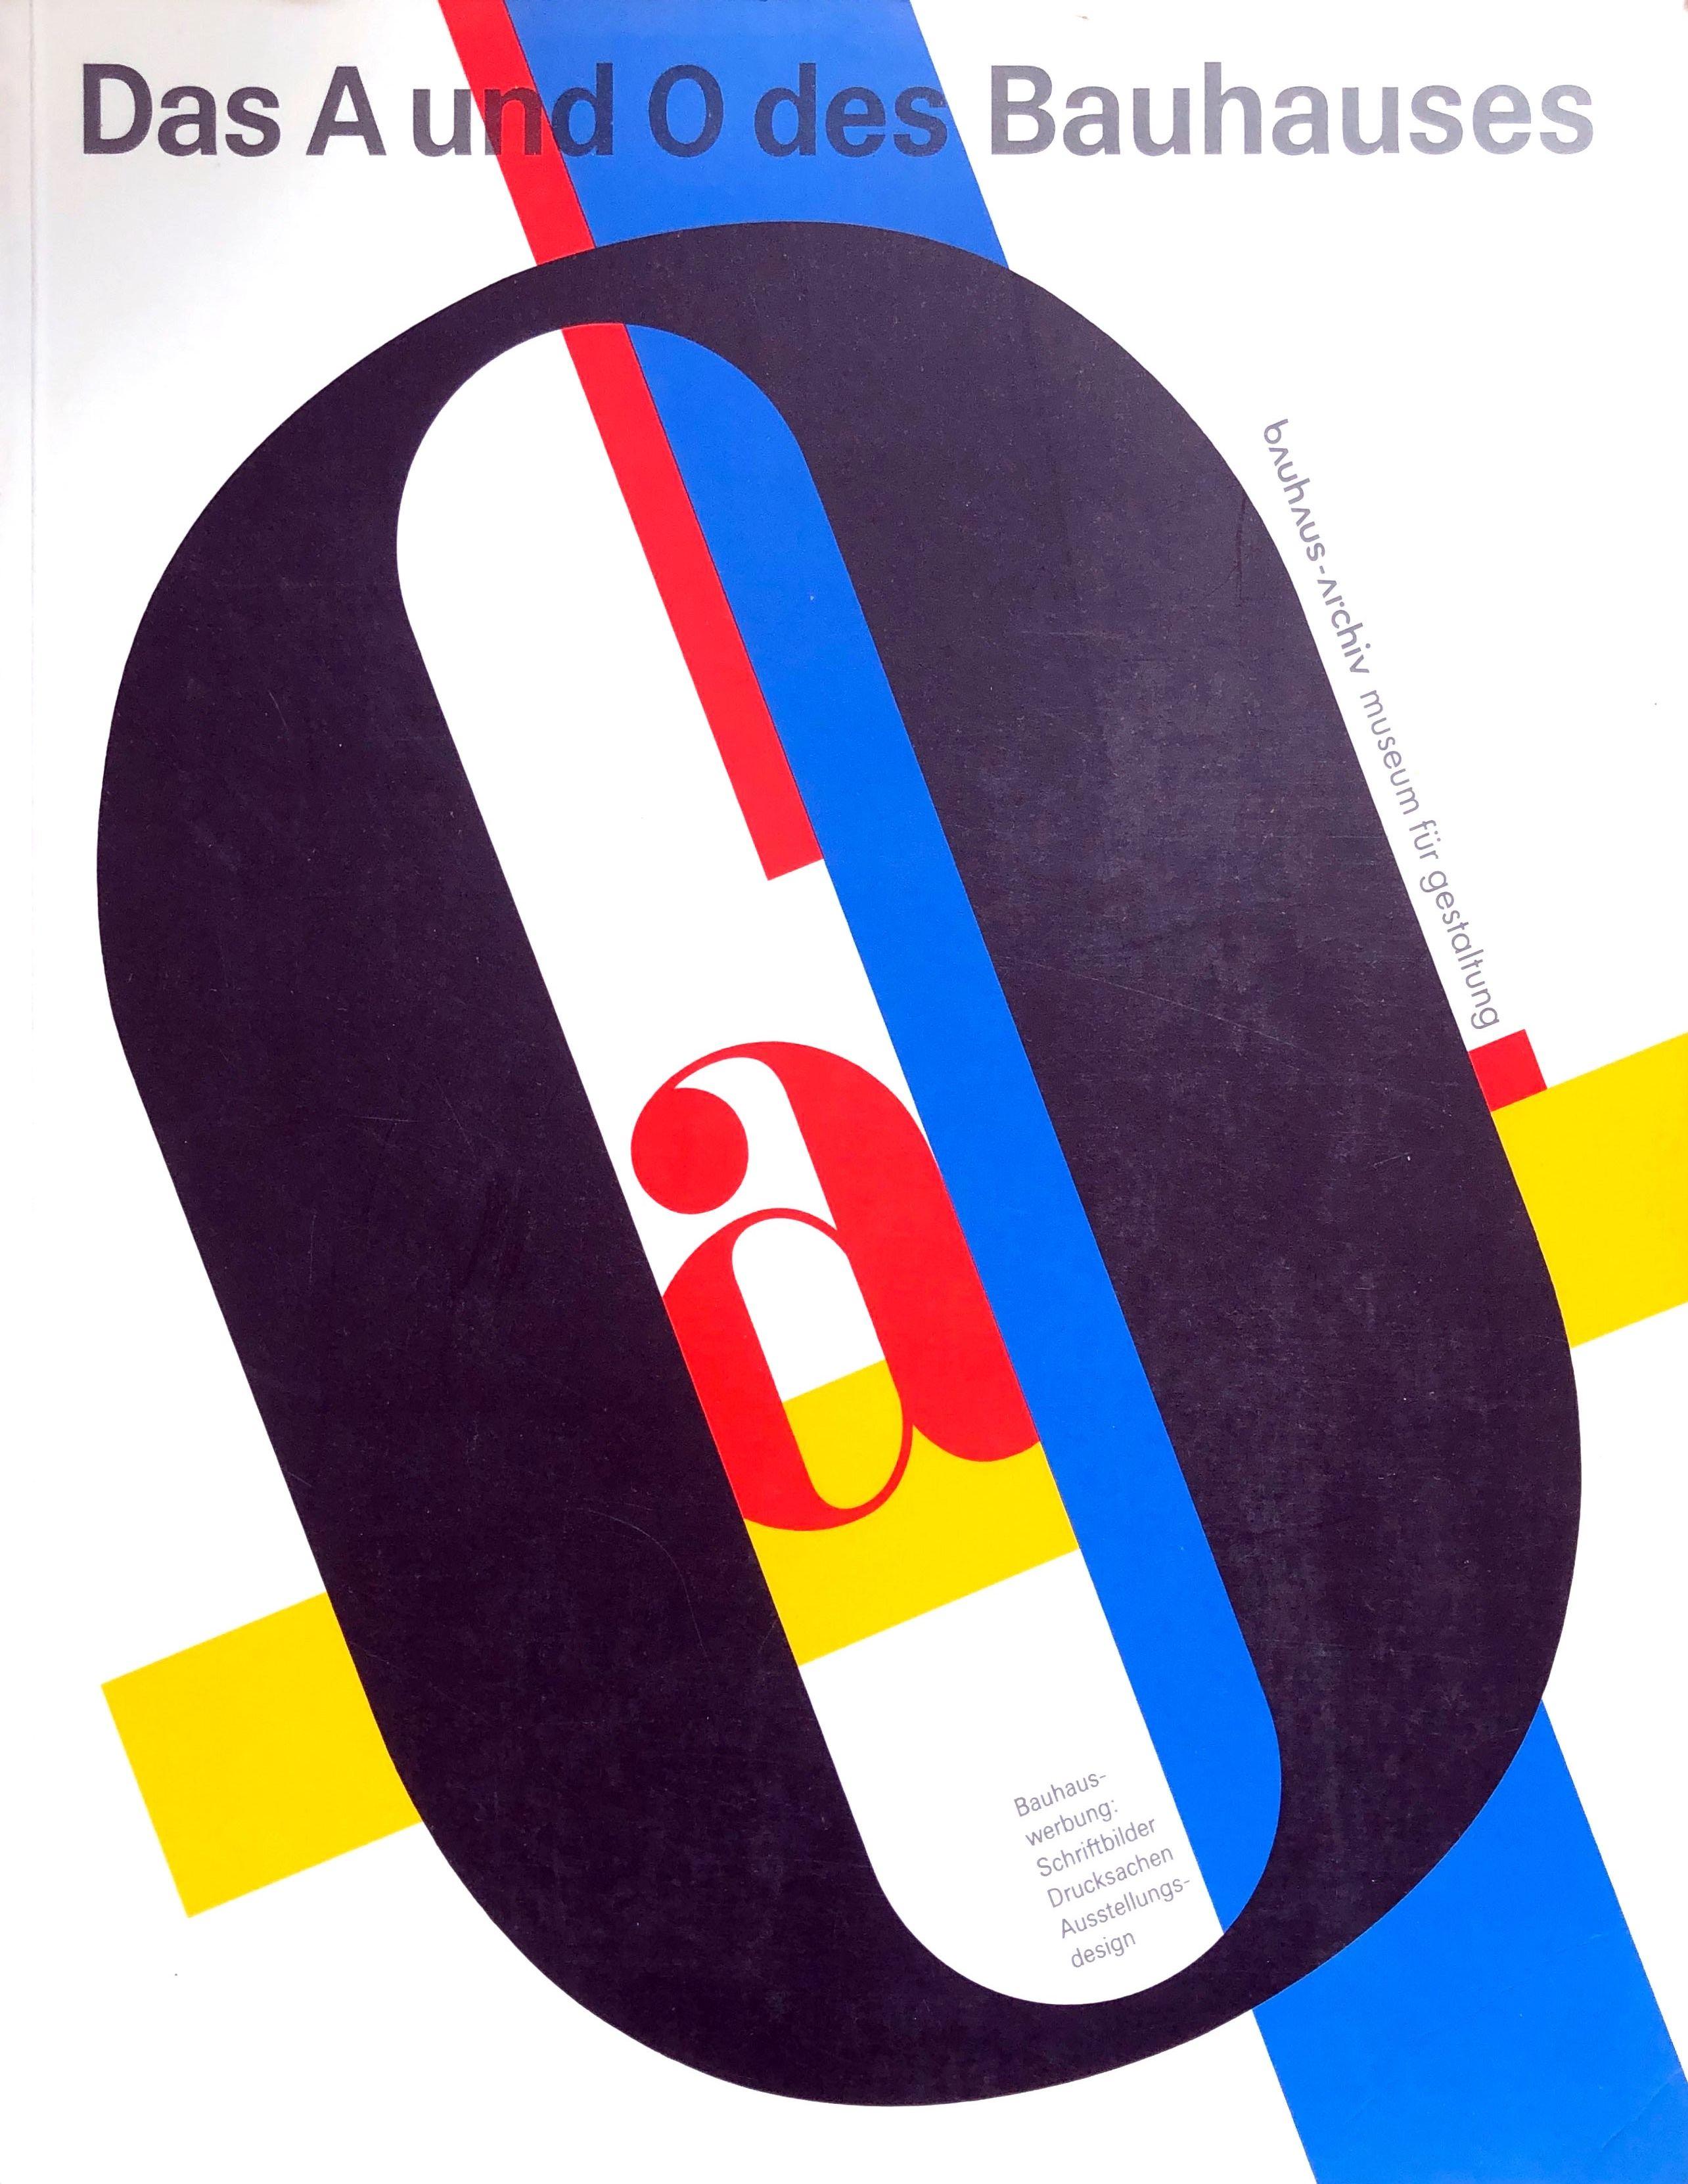 Das A und O des Bauhauses -: Bauhaus-Archiv - Brüning,